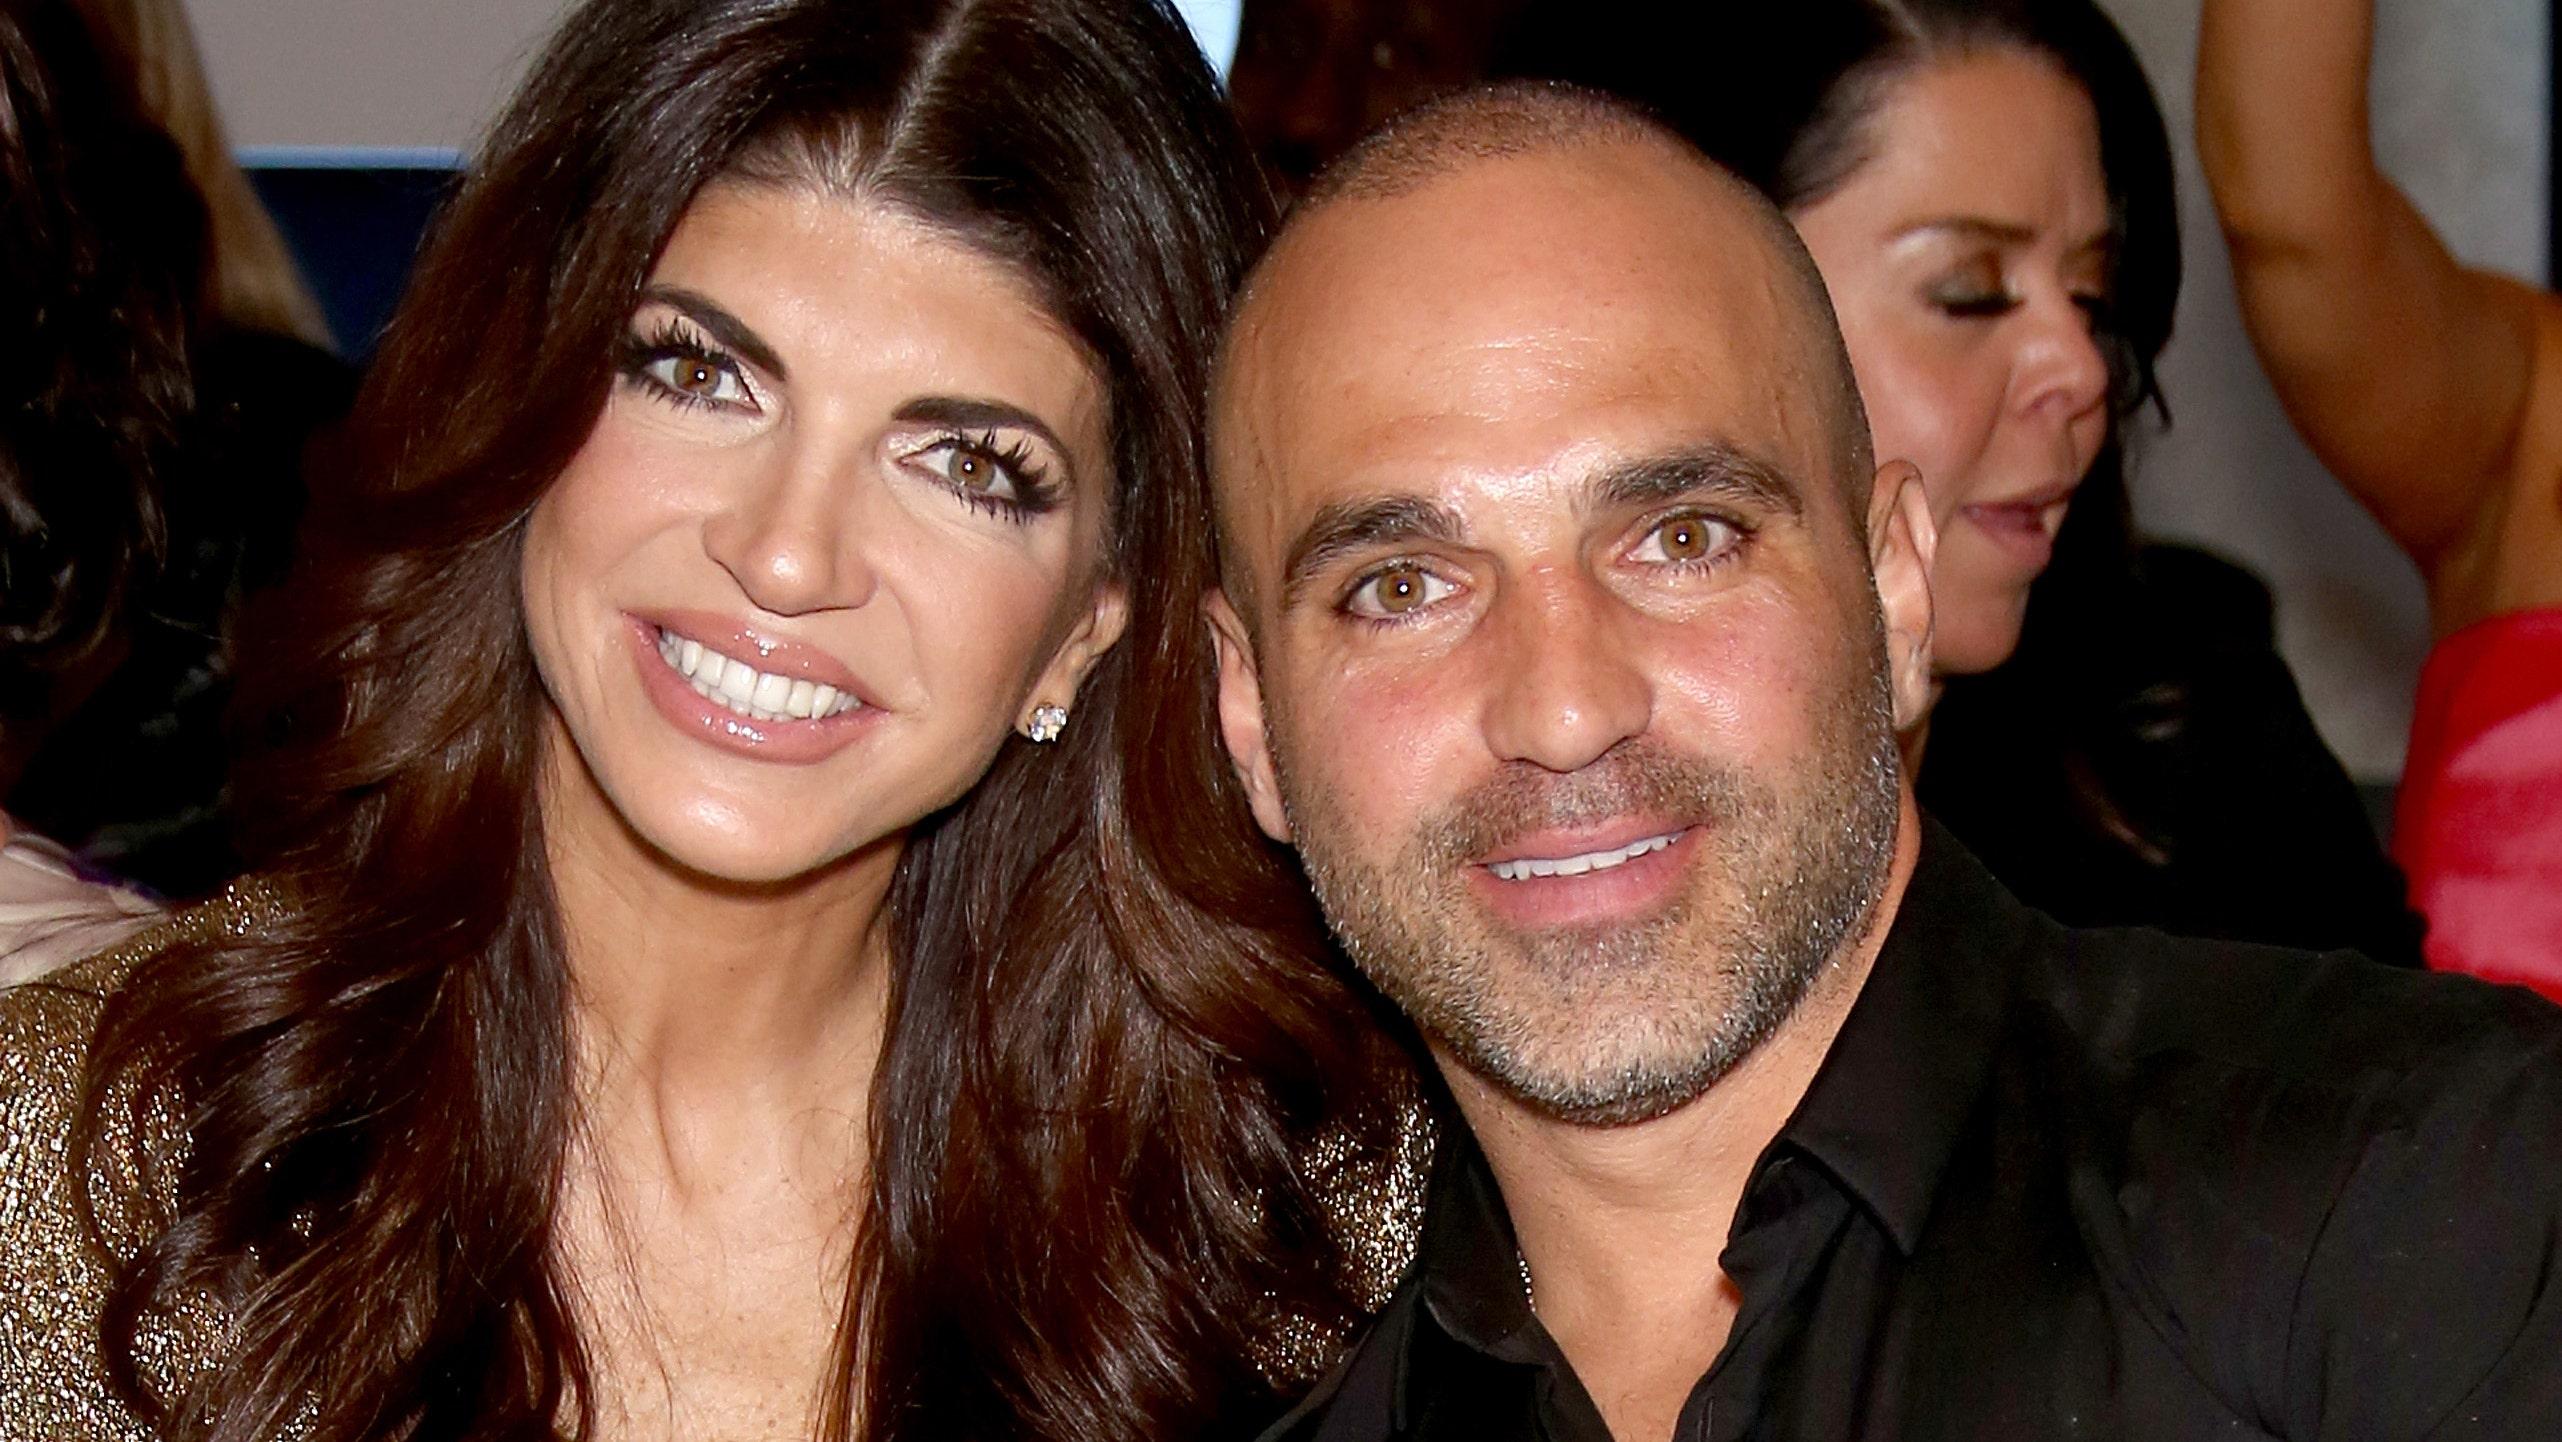 Teresa Giudice's brother Joe Gorga thinks there's 'zero chance' reality star and husband will reconcile